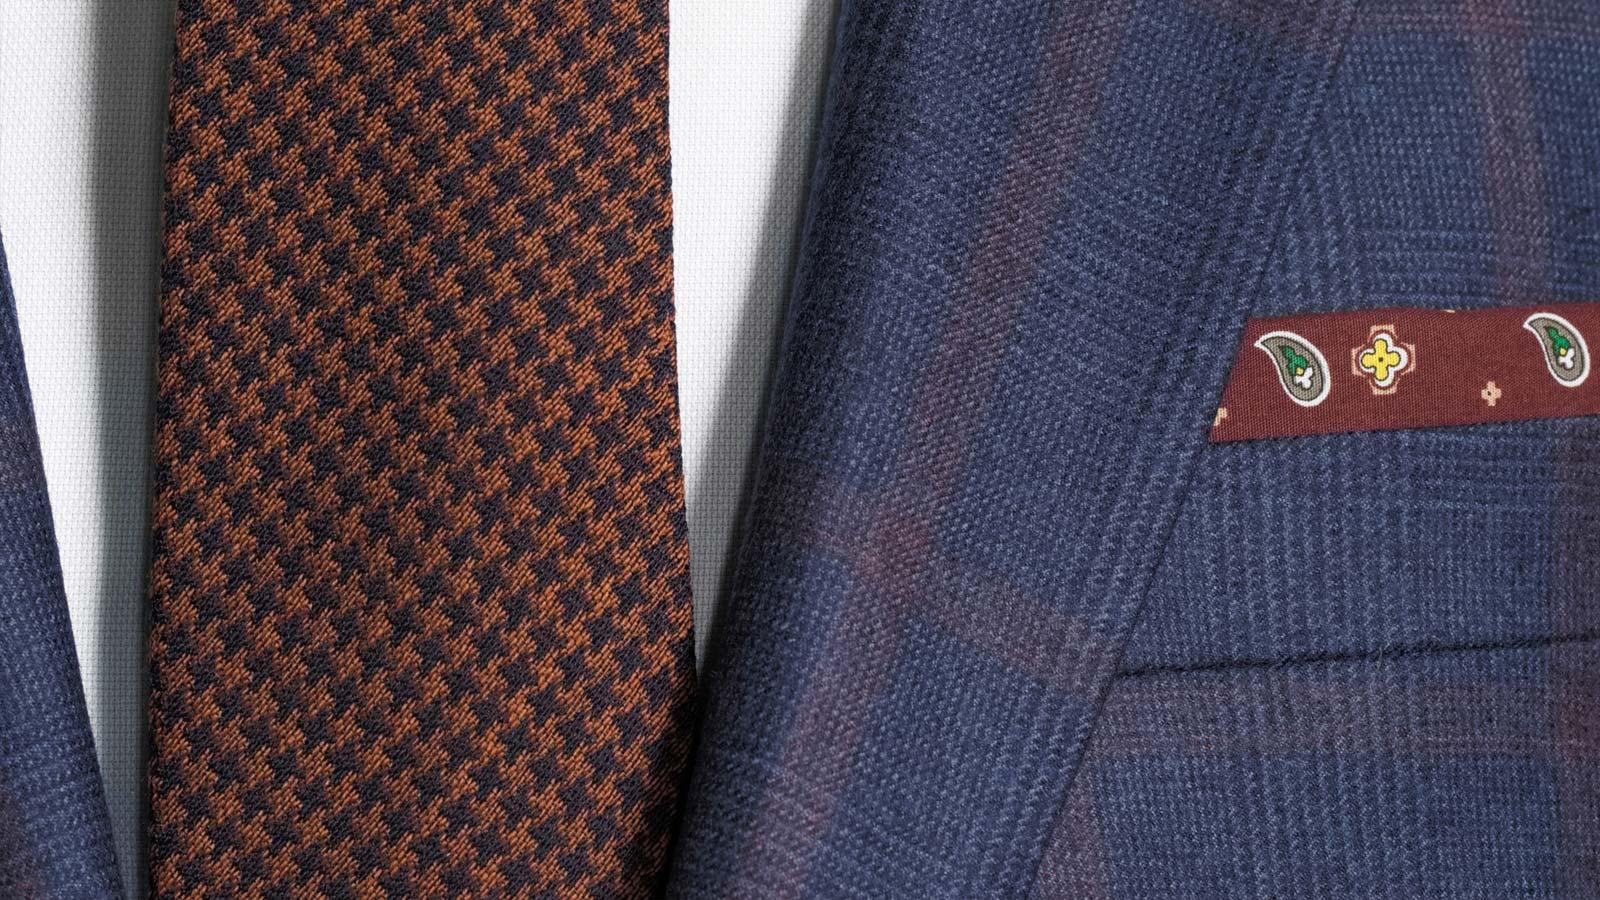 Tangerine Check Navy Plaid Suit - slider image 1